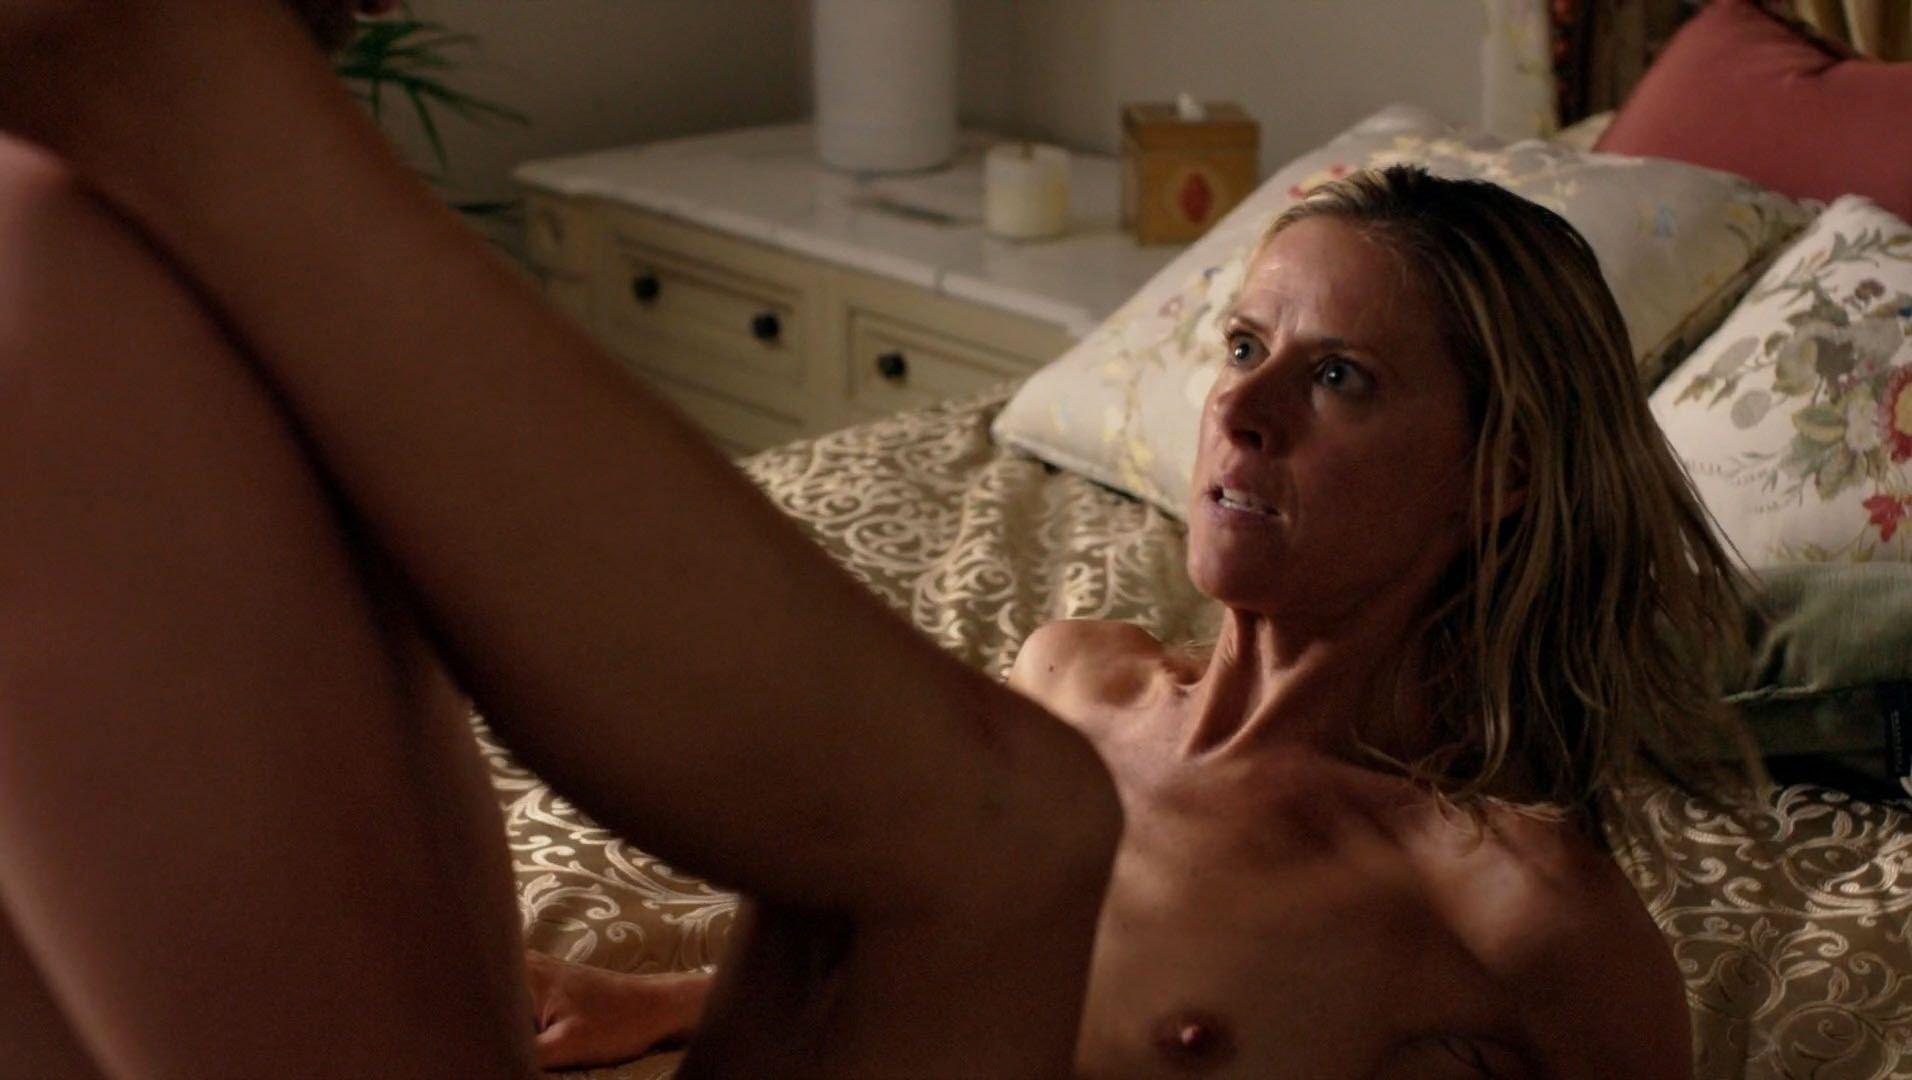 Fuck Kelly Deadmon naked (15 photos), Pussy, Fappening, Twitter, underwear 2019